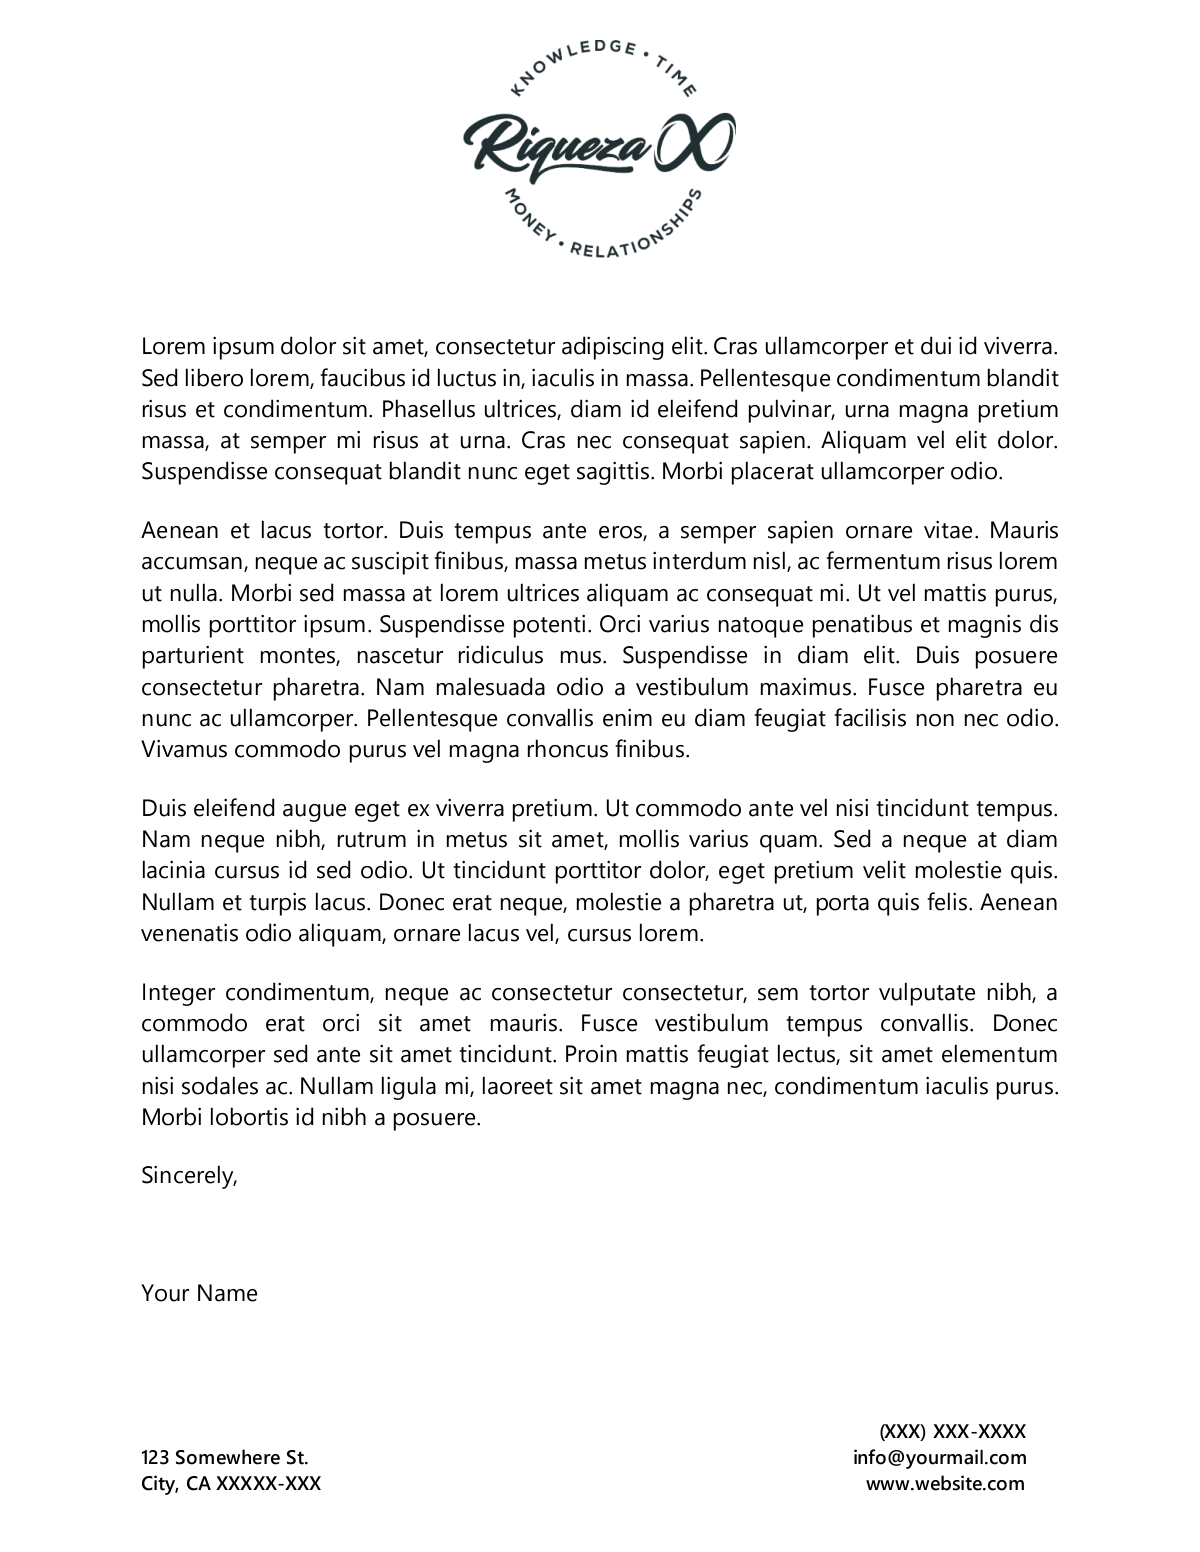 Riqueza X Branding & Social Media Logo